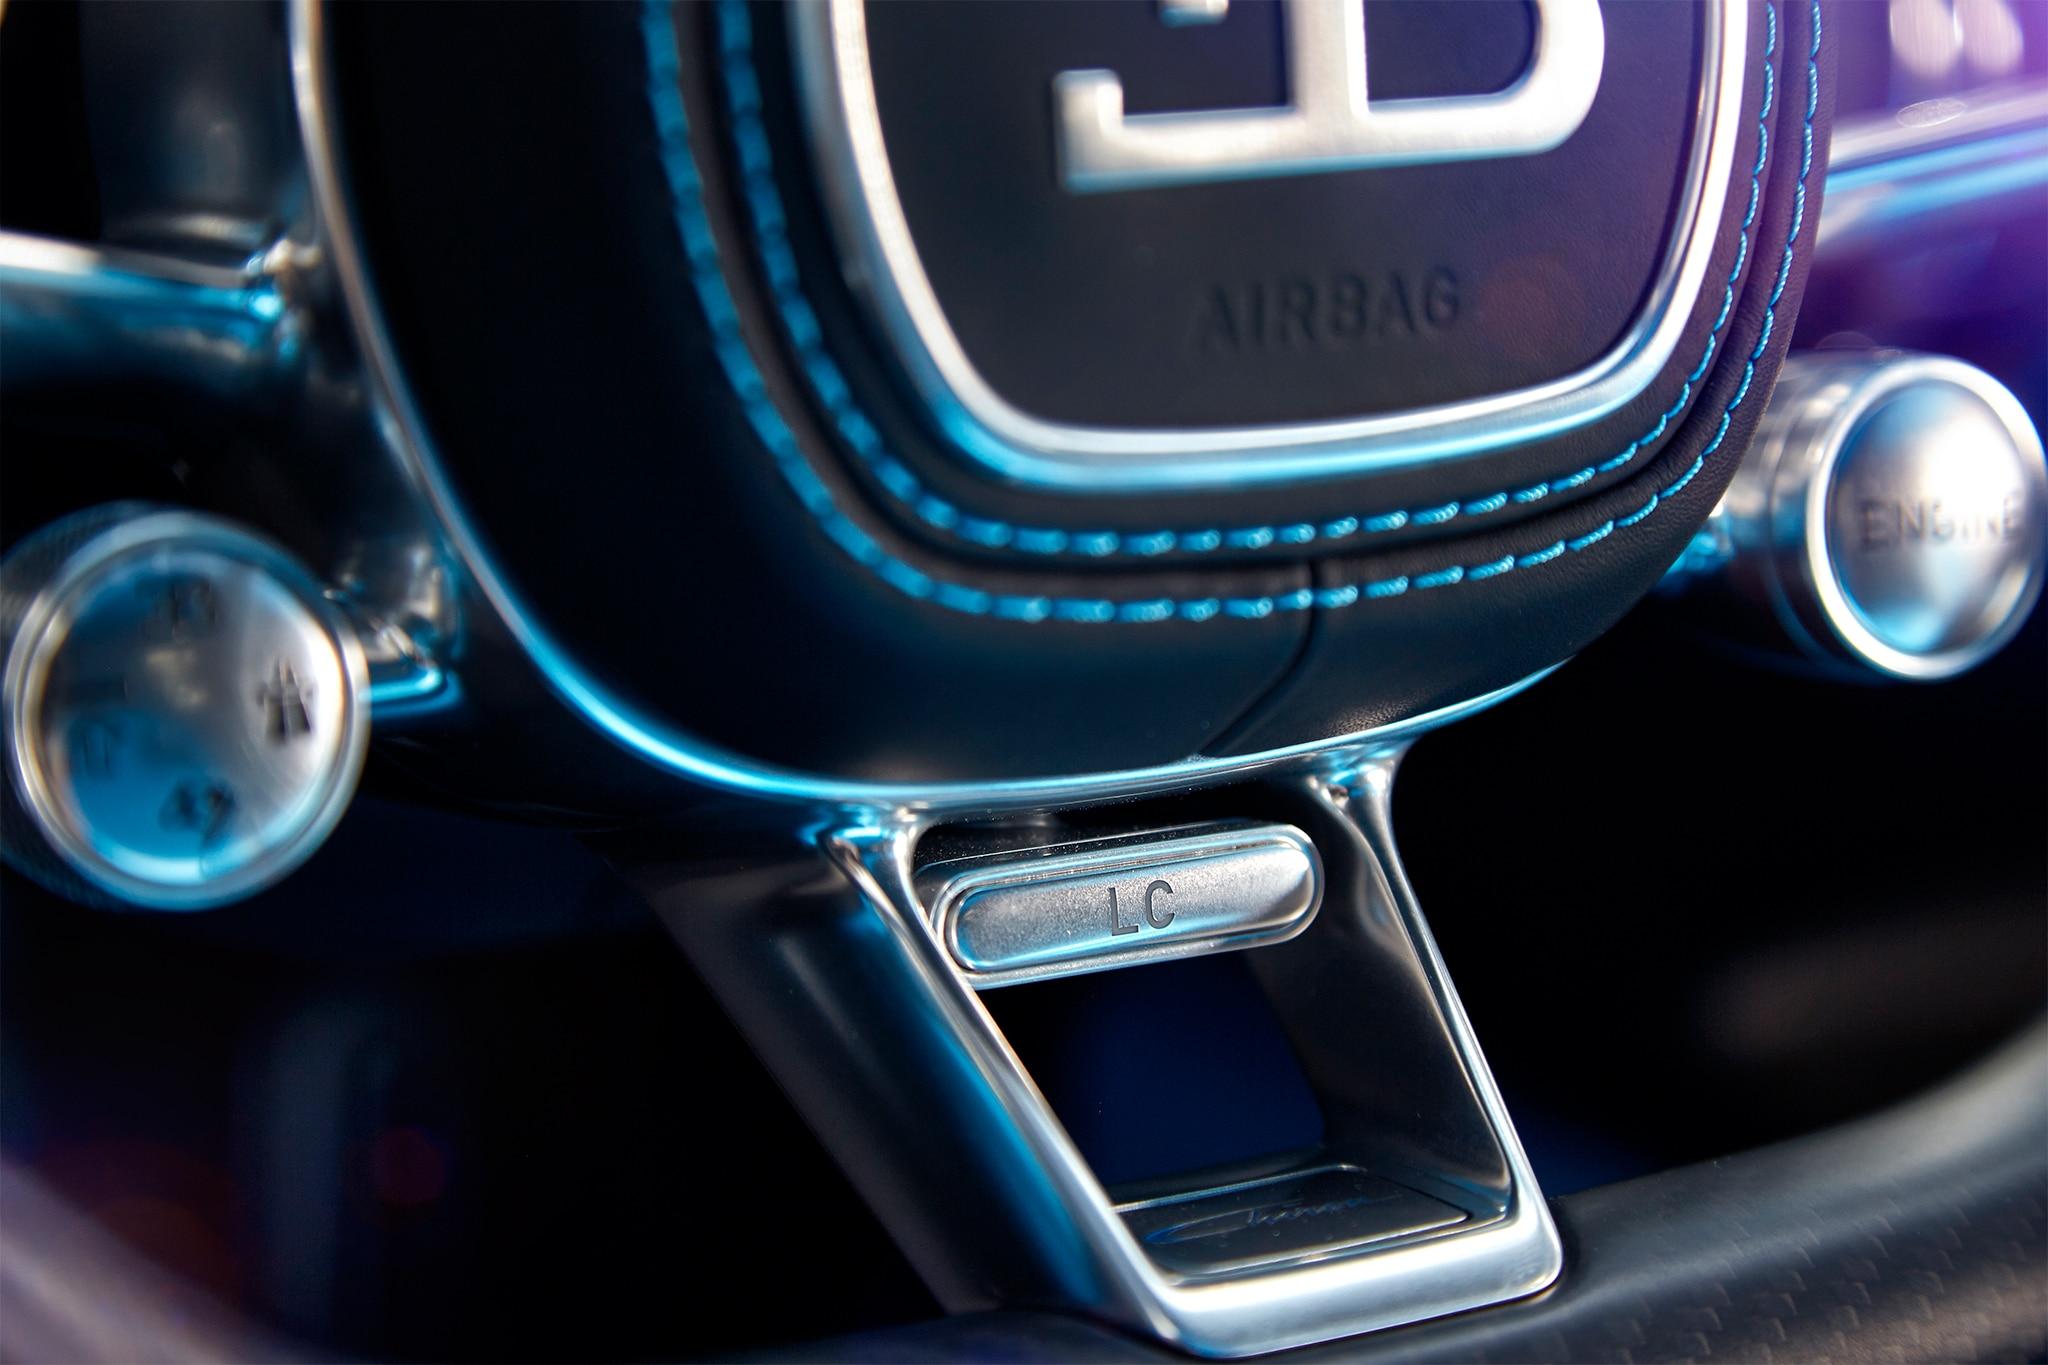 bugatti veyron 2017 interior 2017 bugatti veyron review specs release date price 2018 car. Black Bedroom Furniture Sets. Home Design Ideas